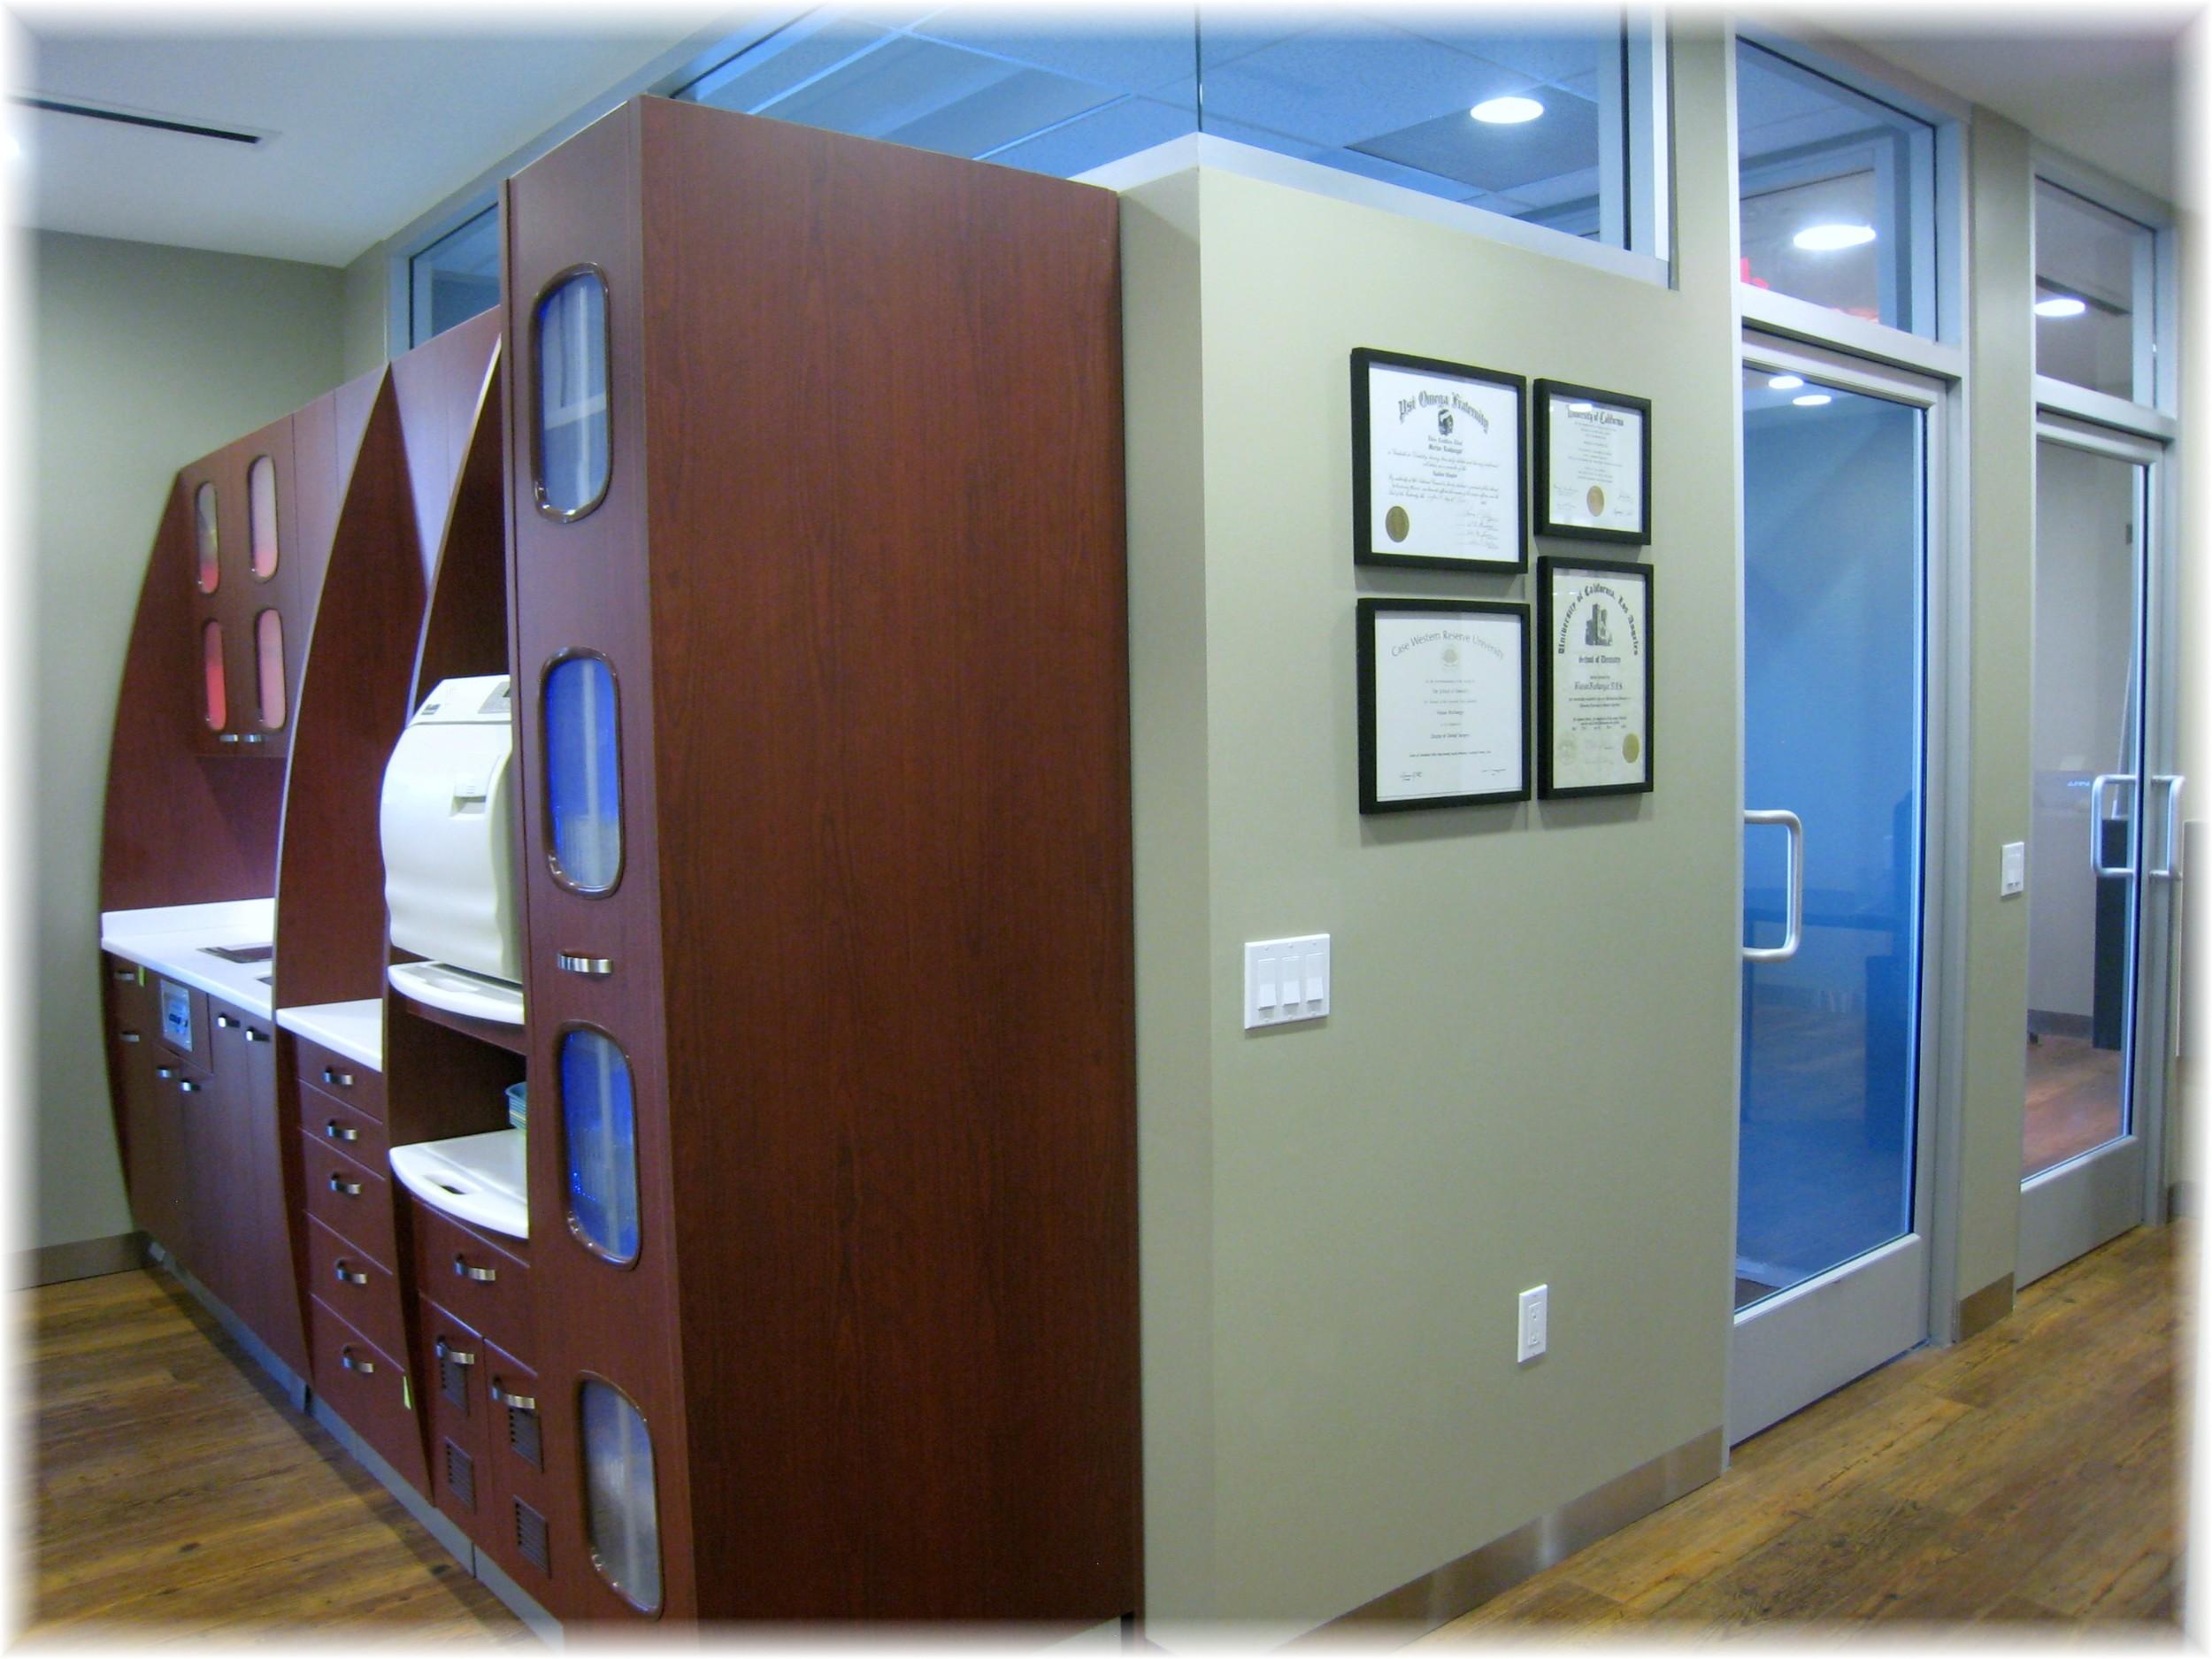 Treatment Room 4 and Sterilization Area